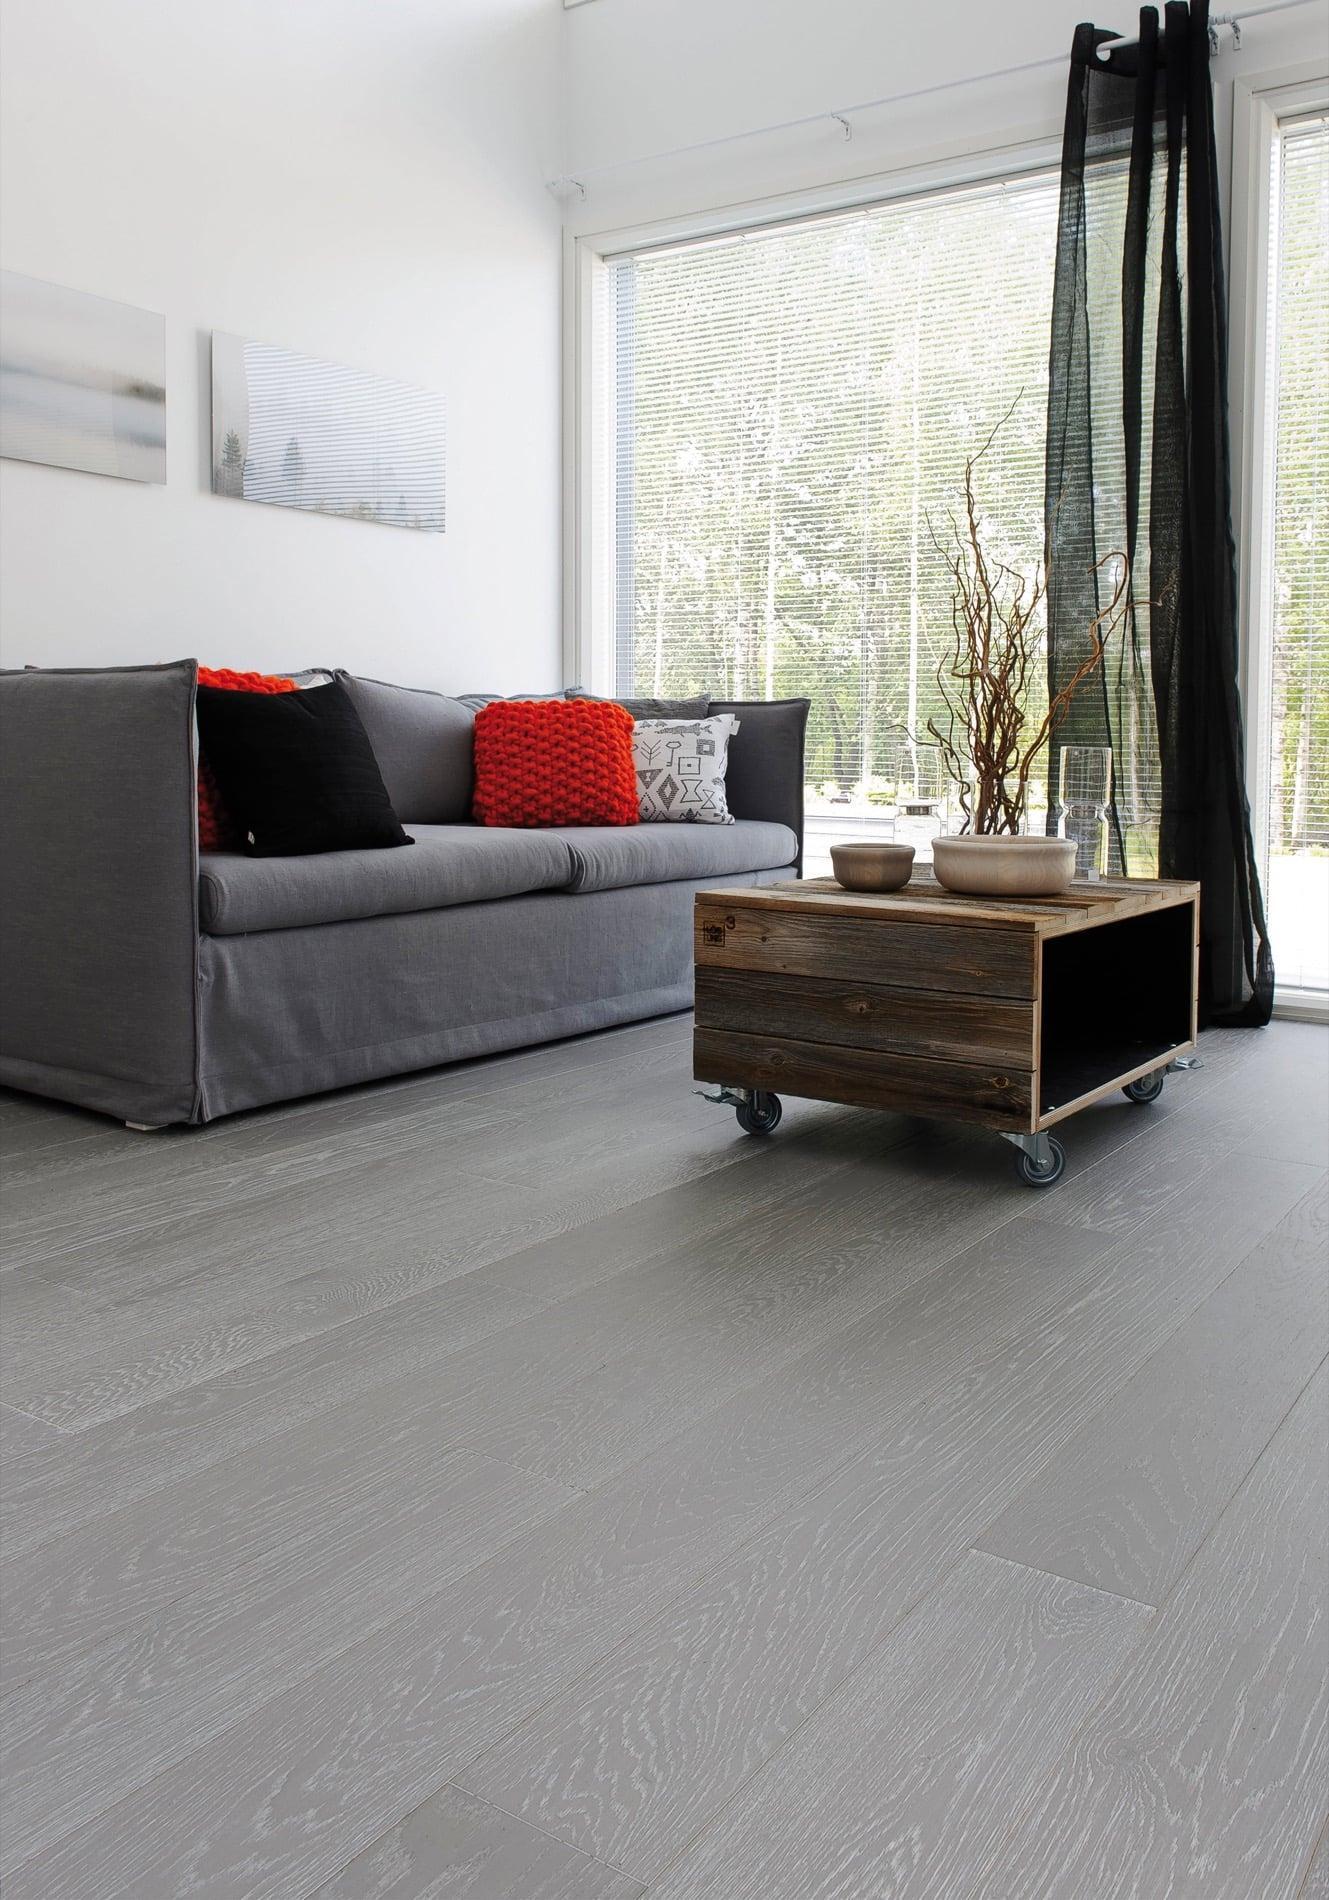 Timberwise parketti puulattia wooden floor parquet Tammi Oak Silver_pysty2